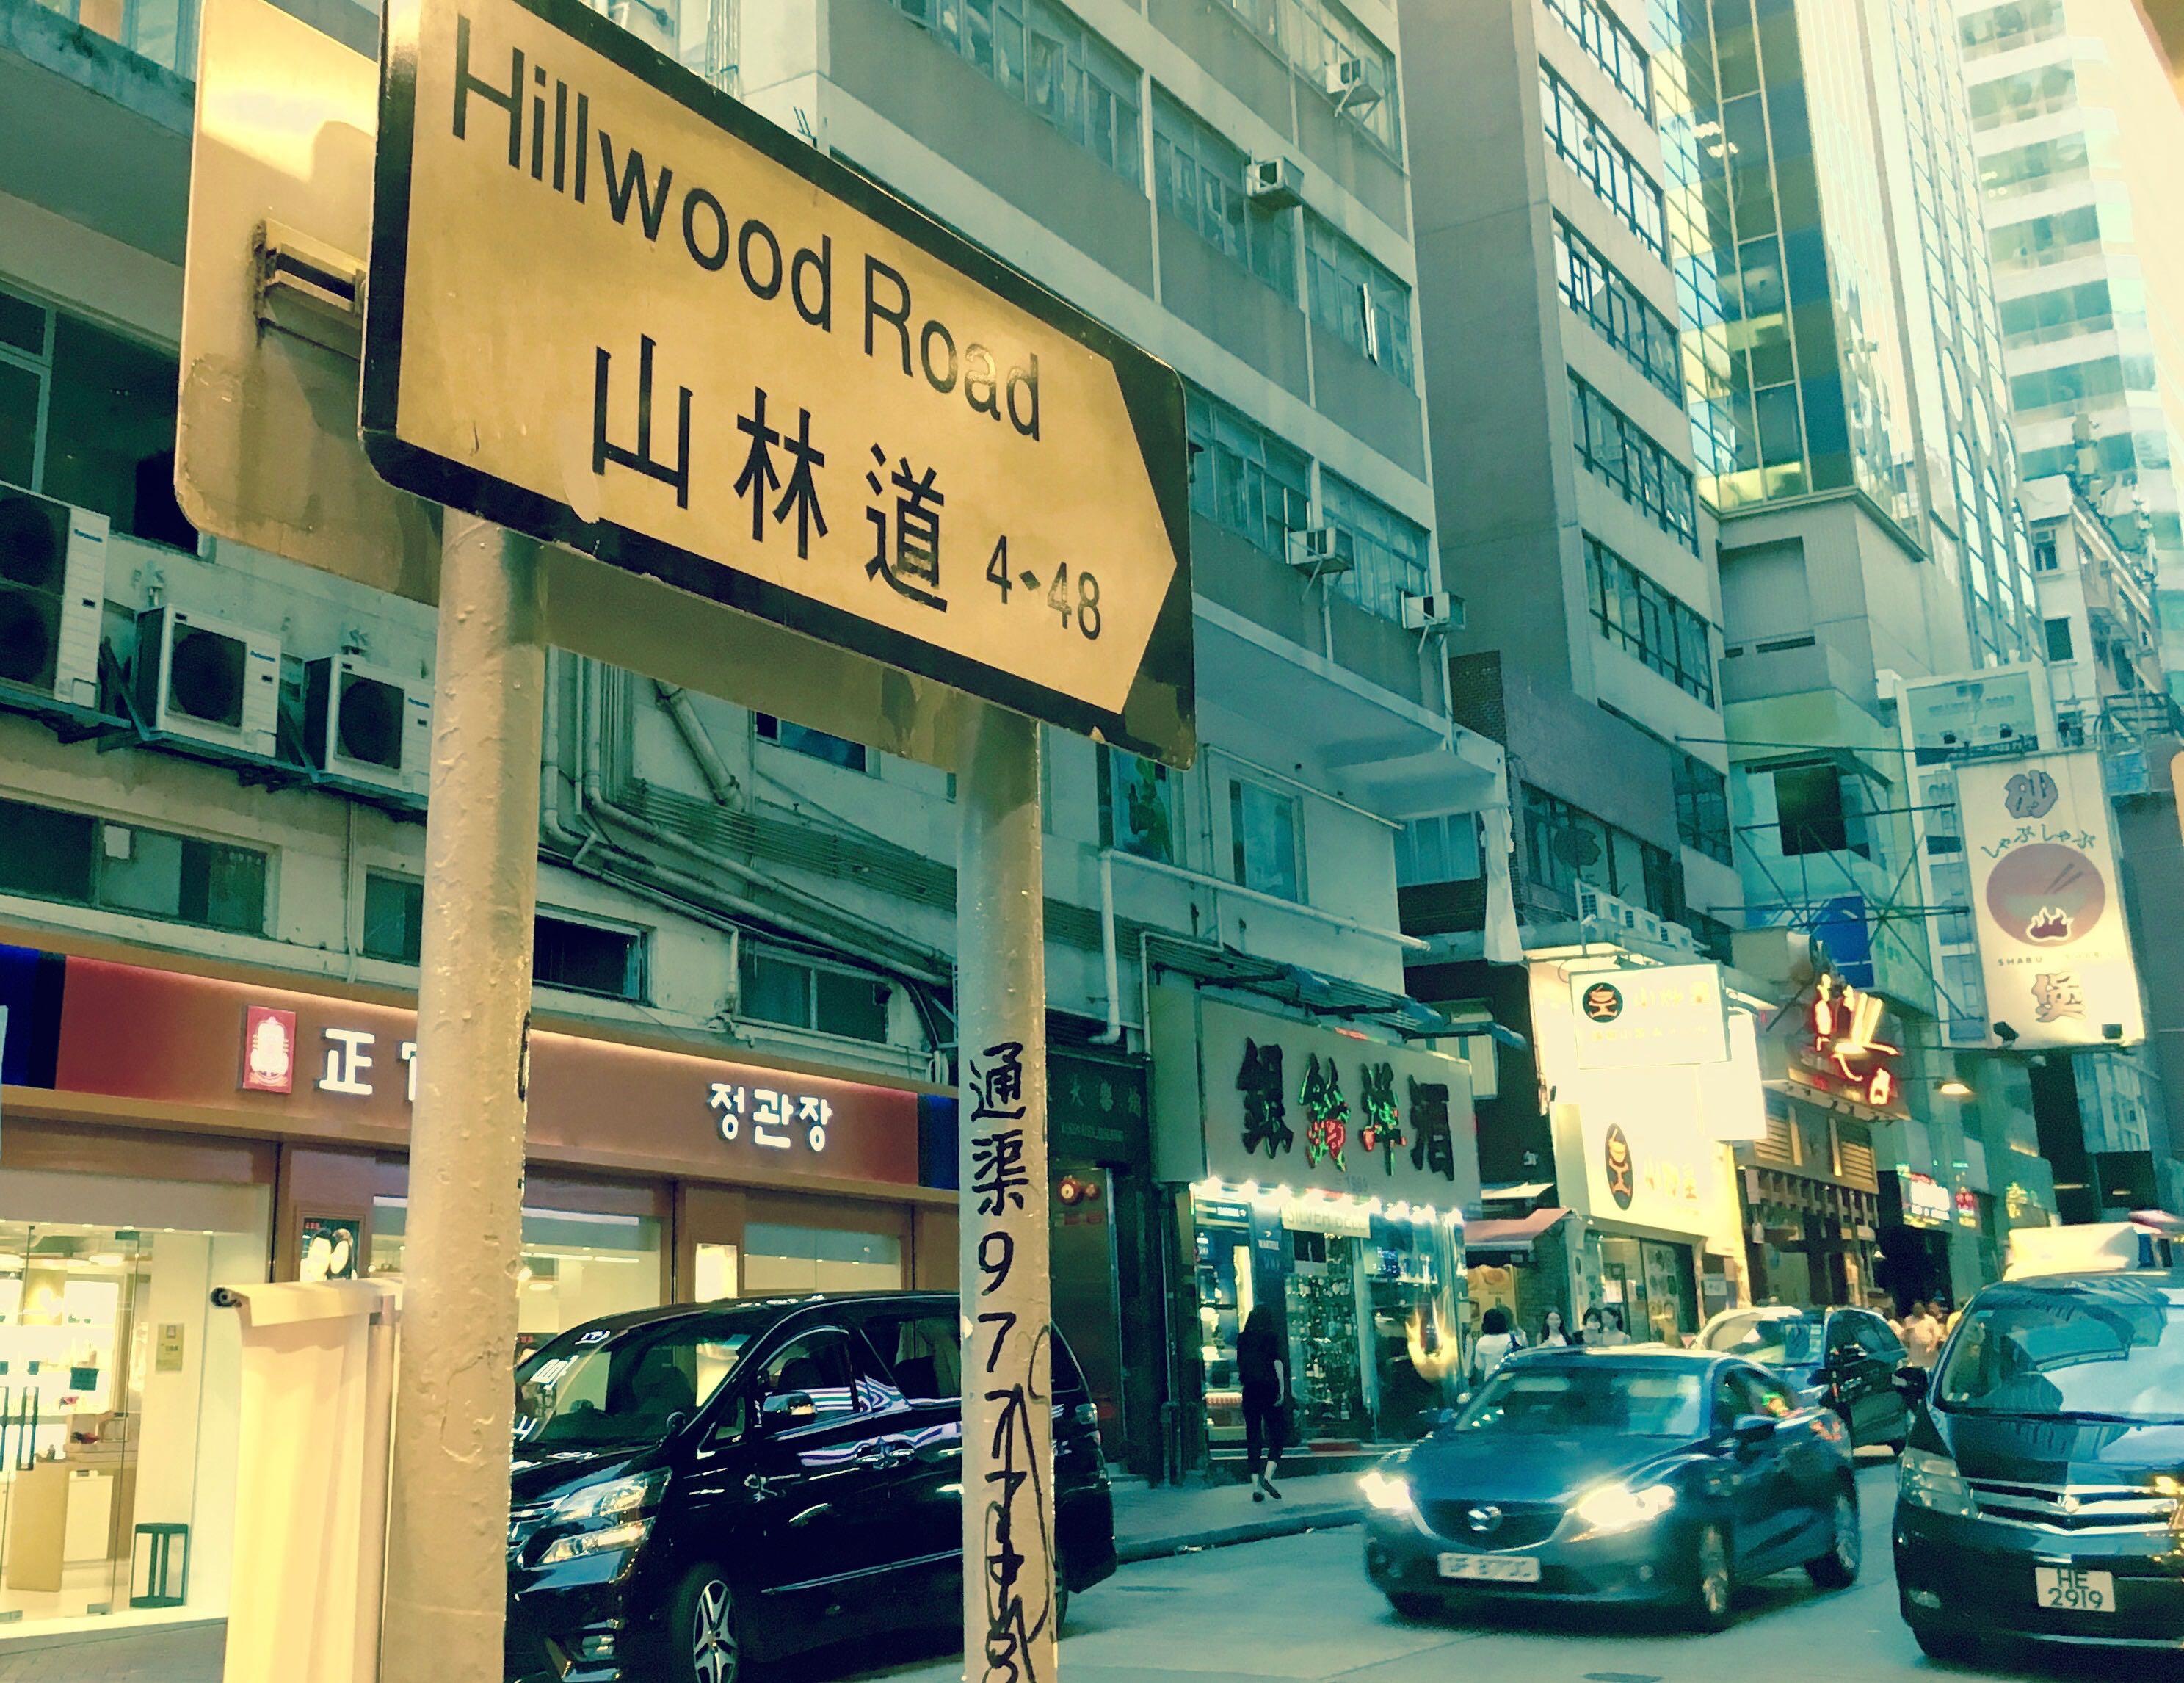 Hong Kong Tsim Sha Tsui Hillwood Road full kitchen licence ...